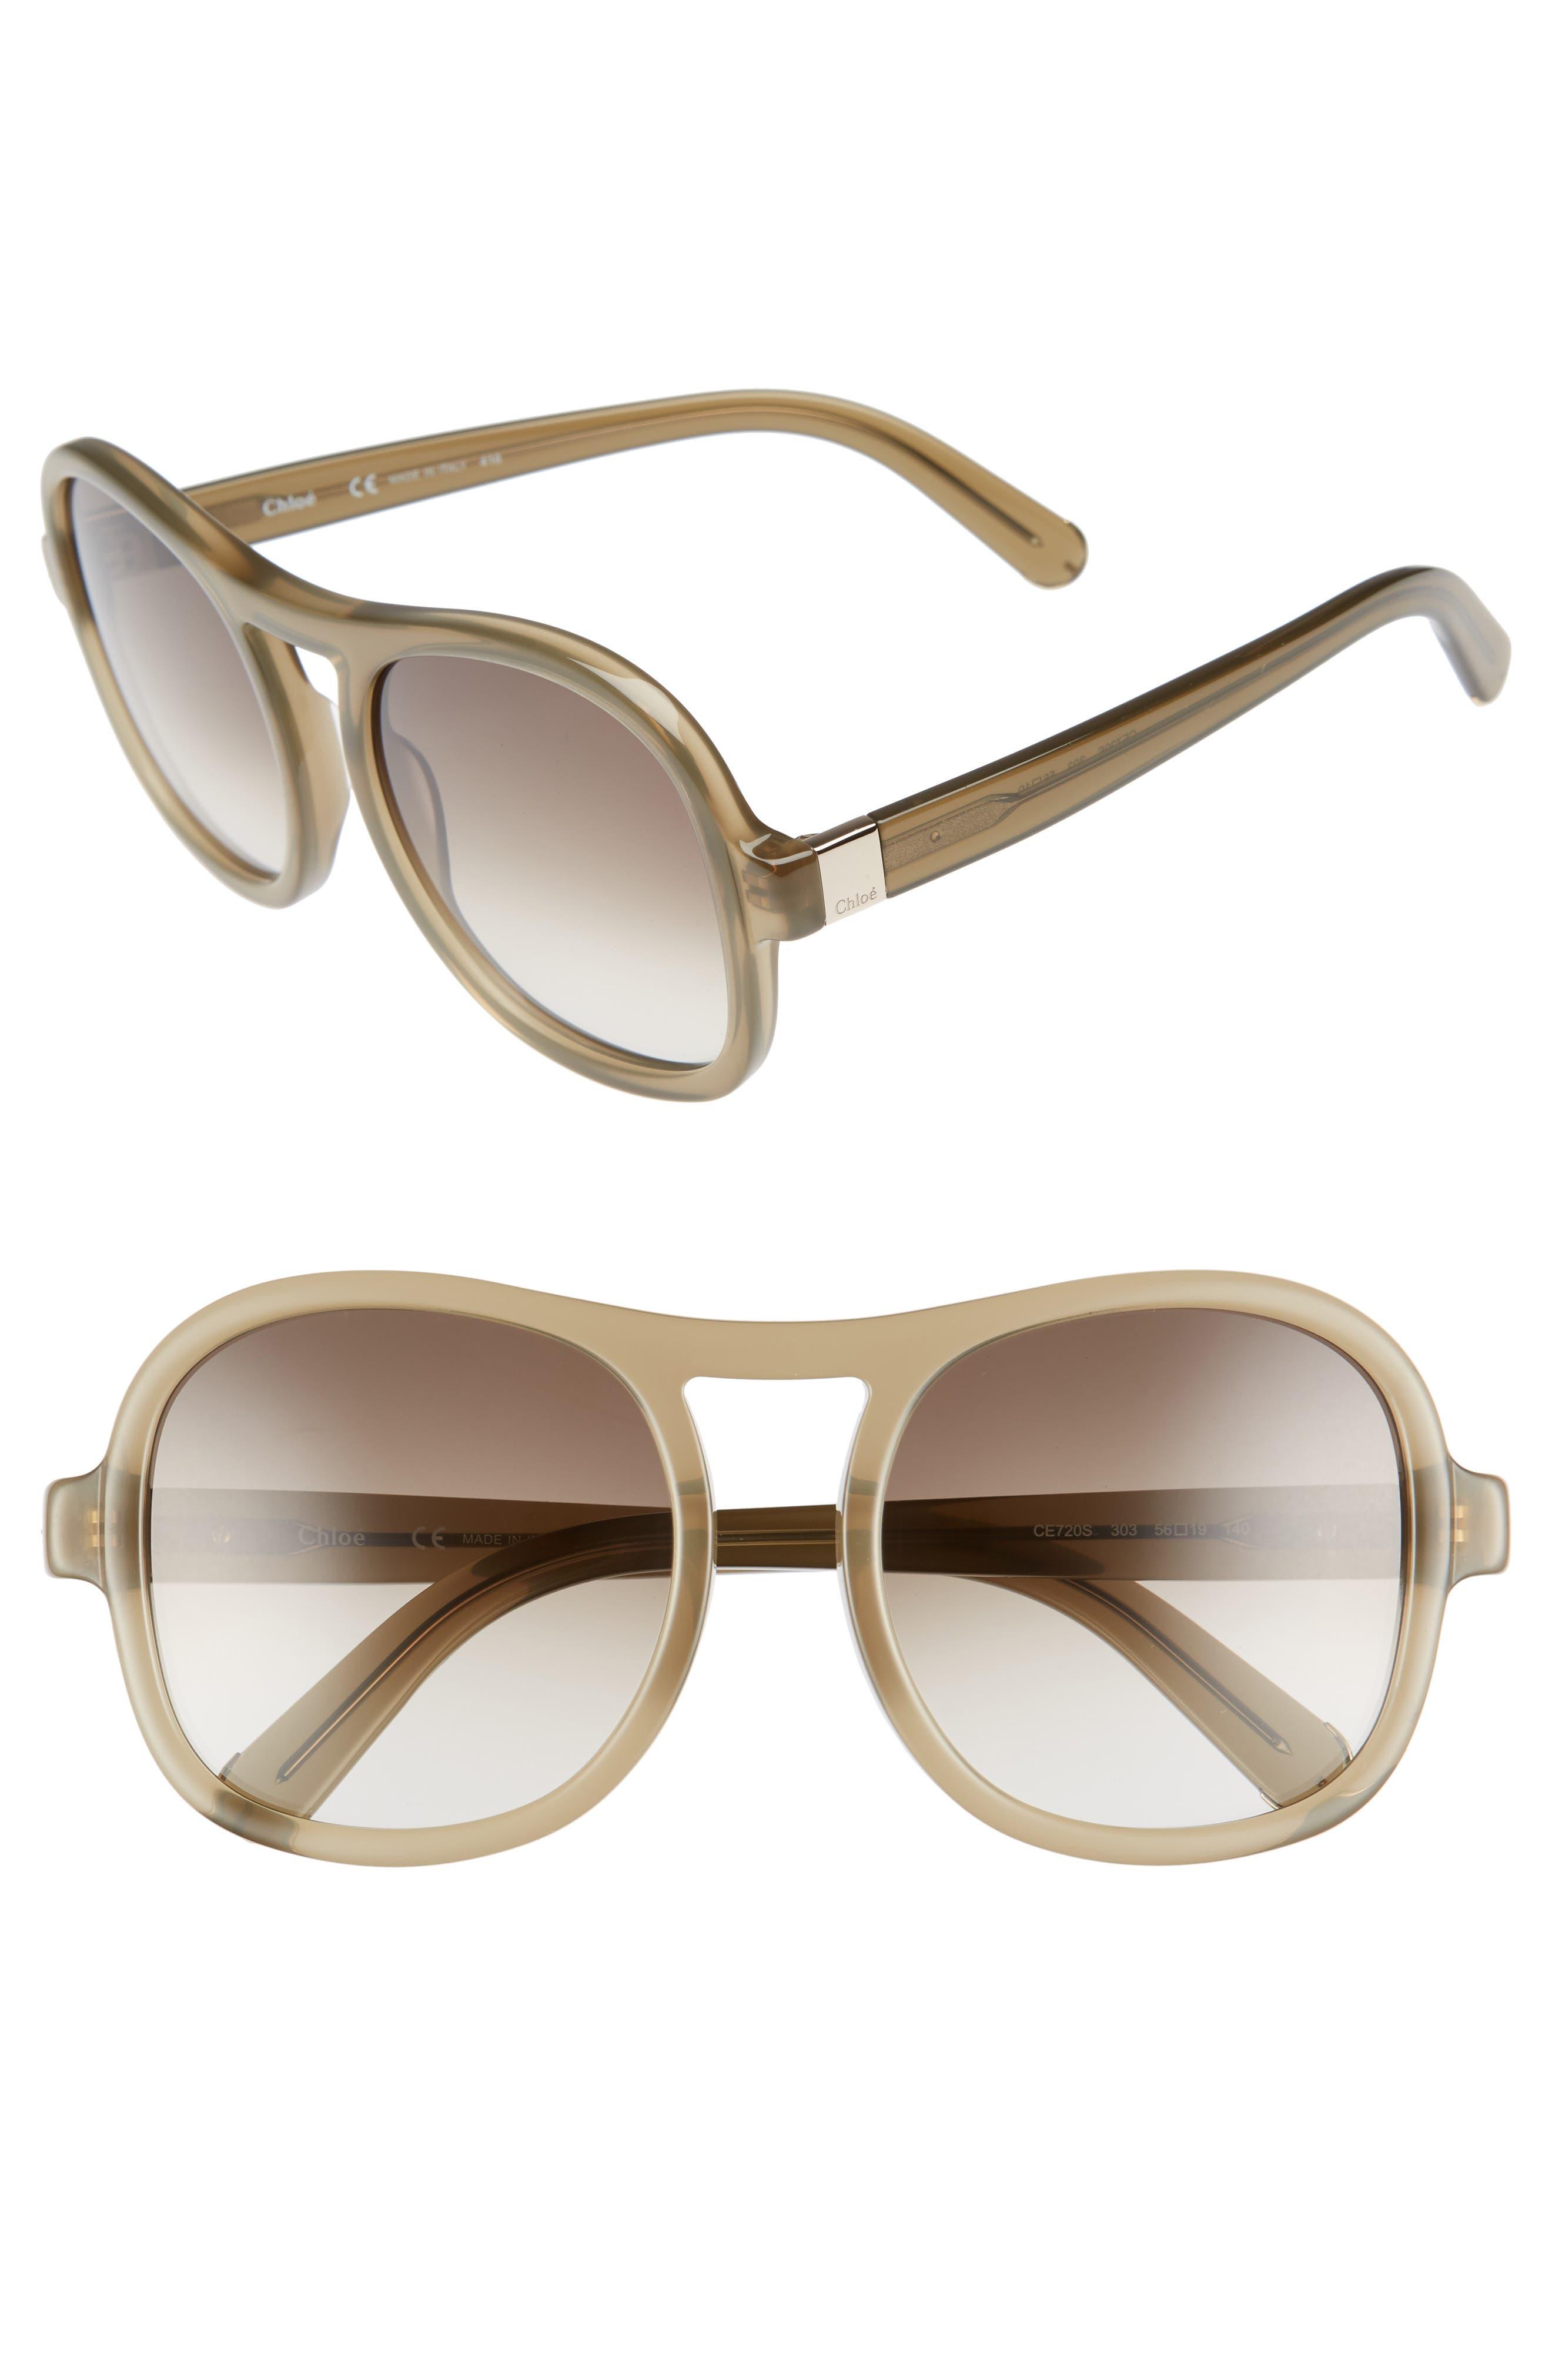 Marlow 56mm Gradient Lens Sunglasses,                         Main,                         color, Khaki